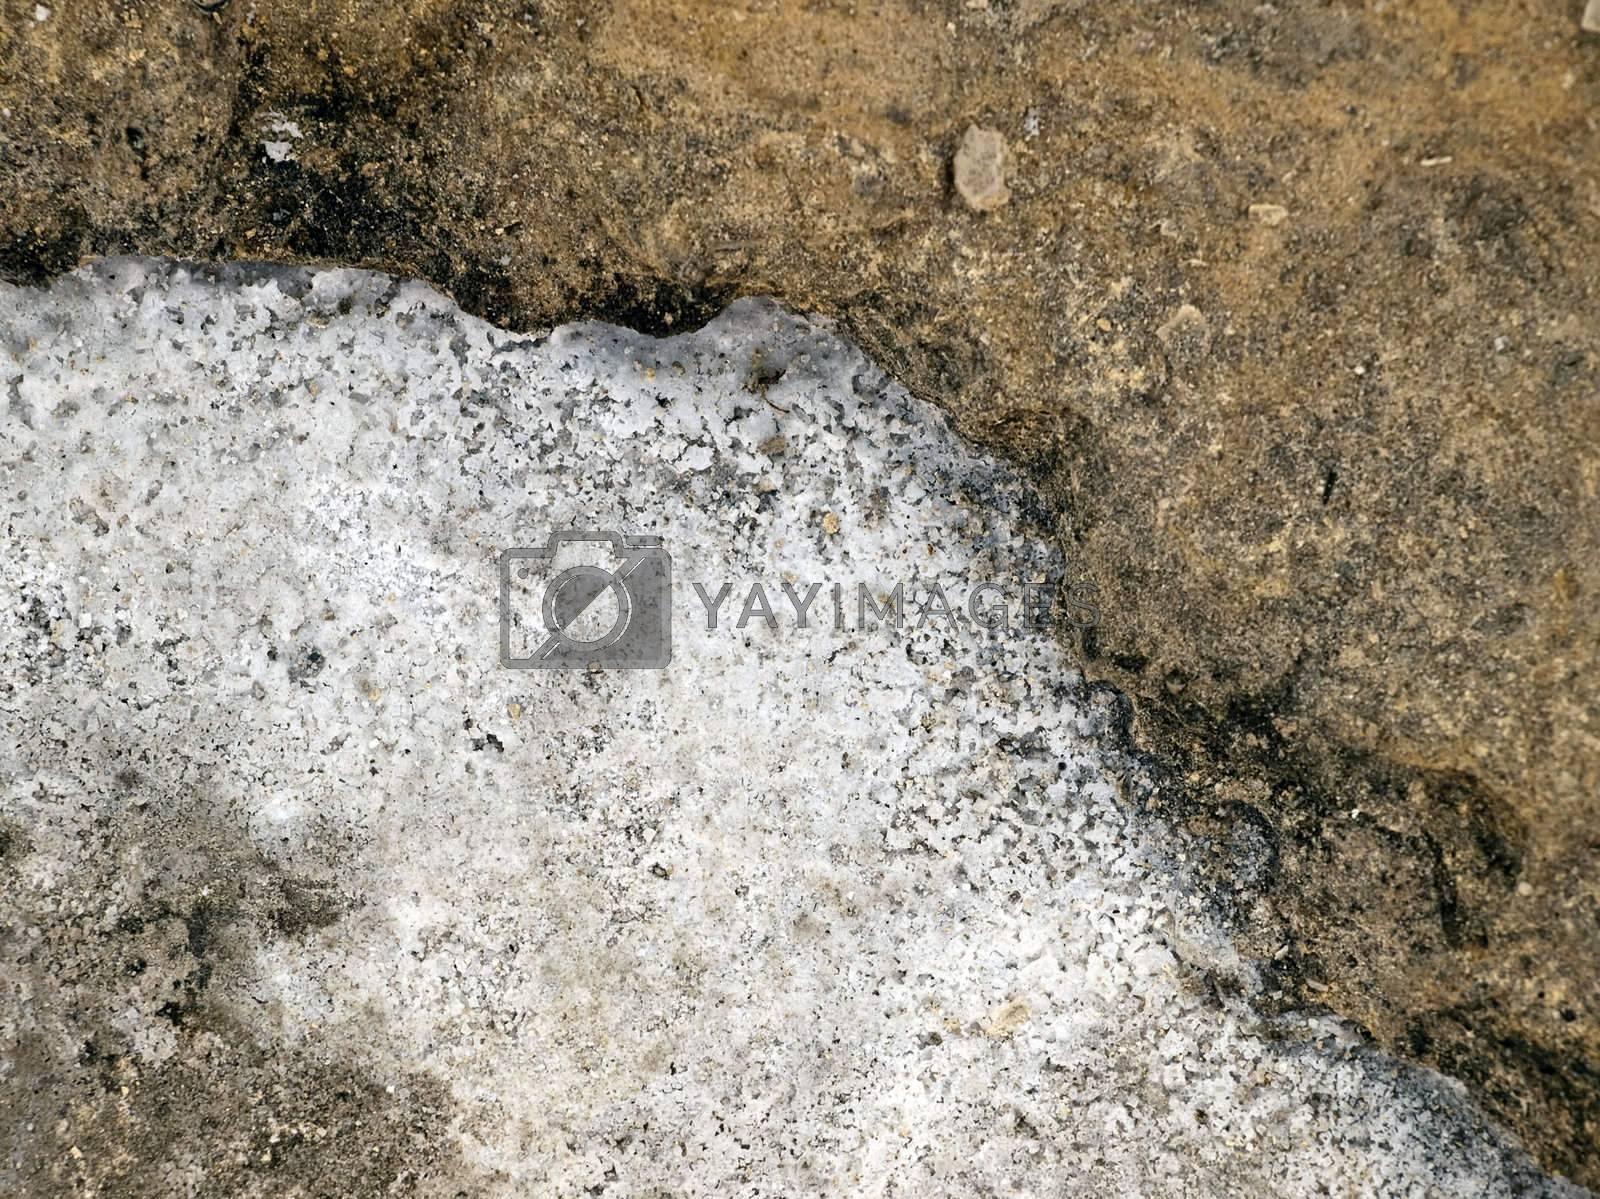 Royalty free image of Crystalline Sea Salt by PhotoWorks